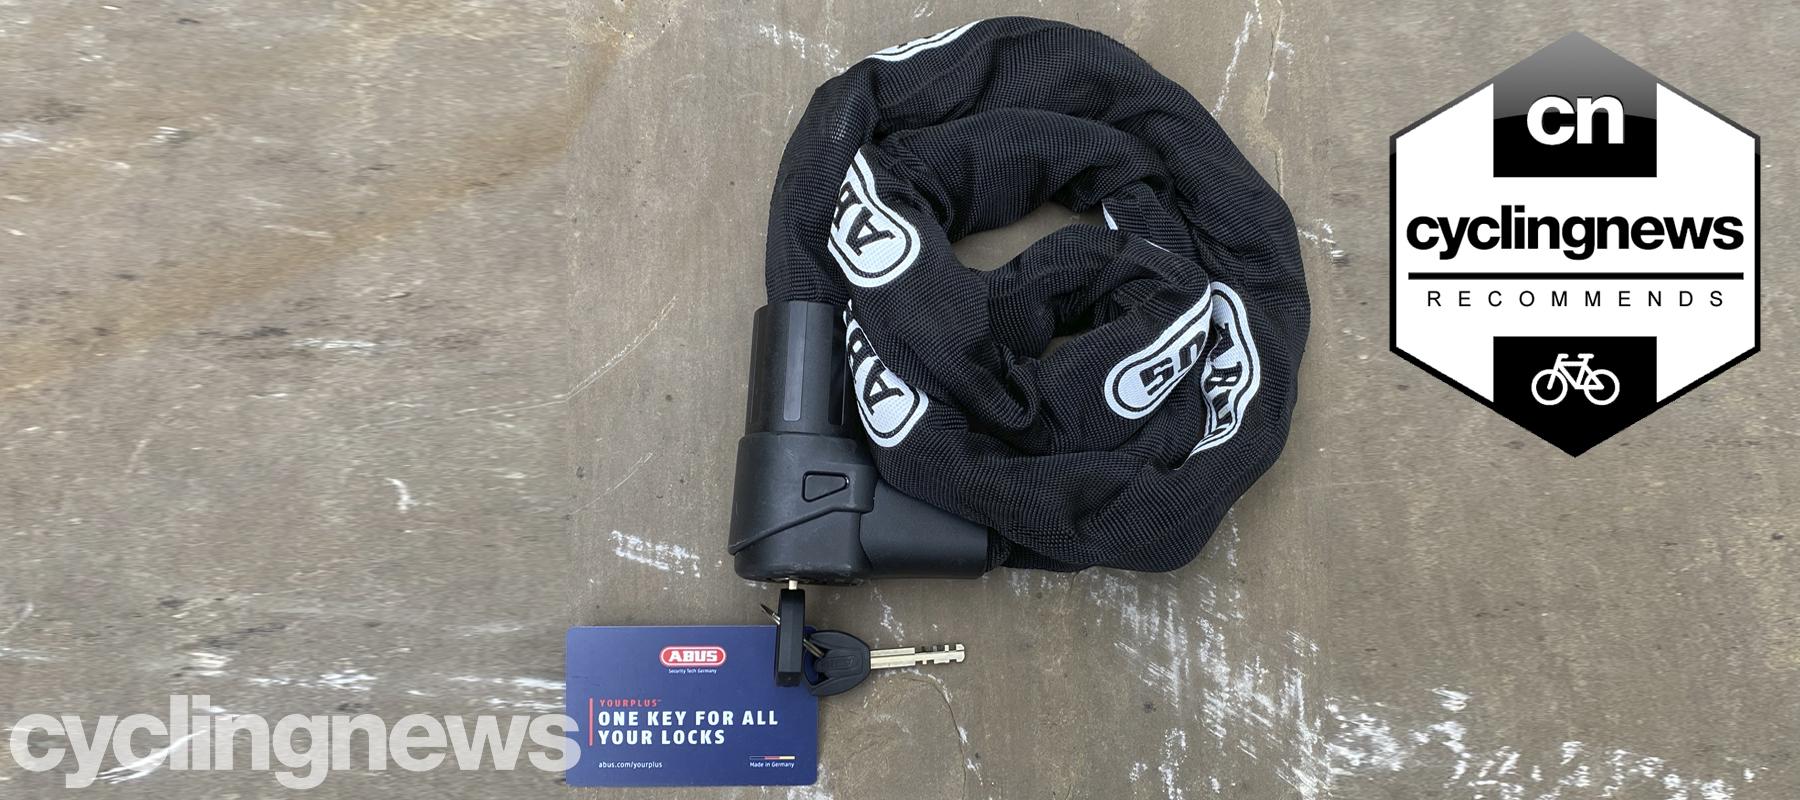 ABUS Chain CITYCHAIN 1010 Ø 9mm Lock Bicycle Bike Locks